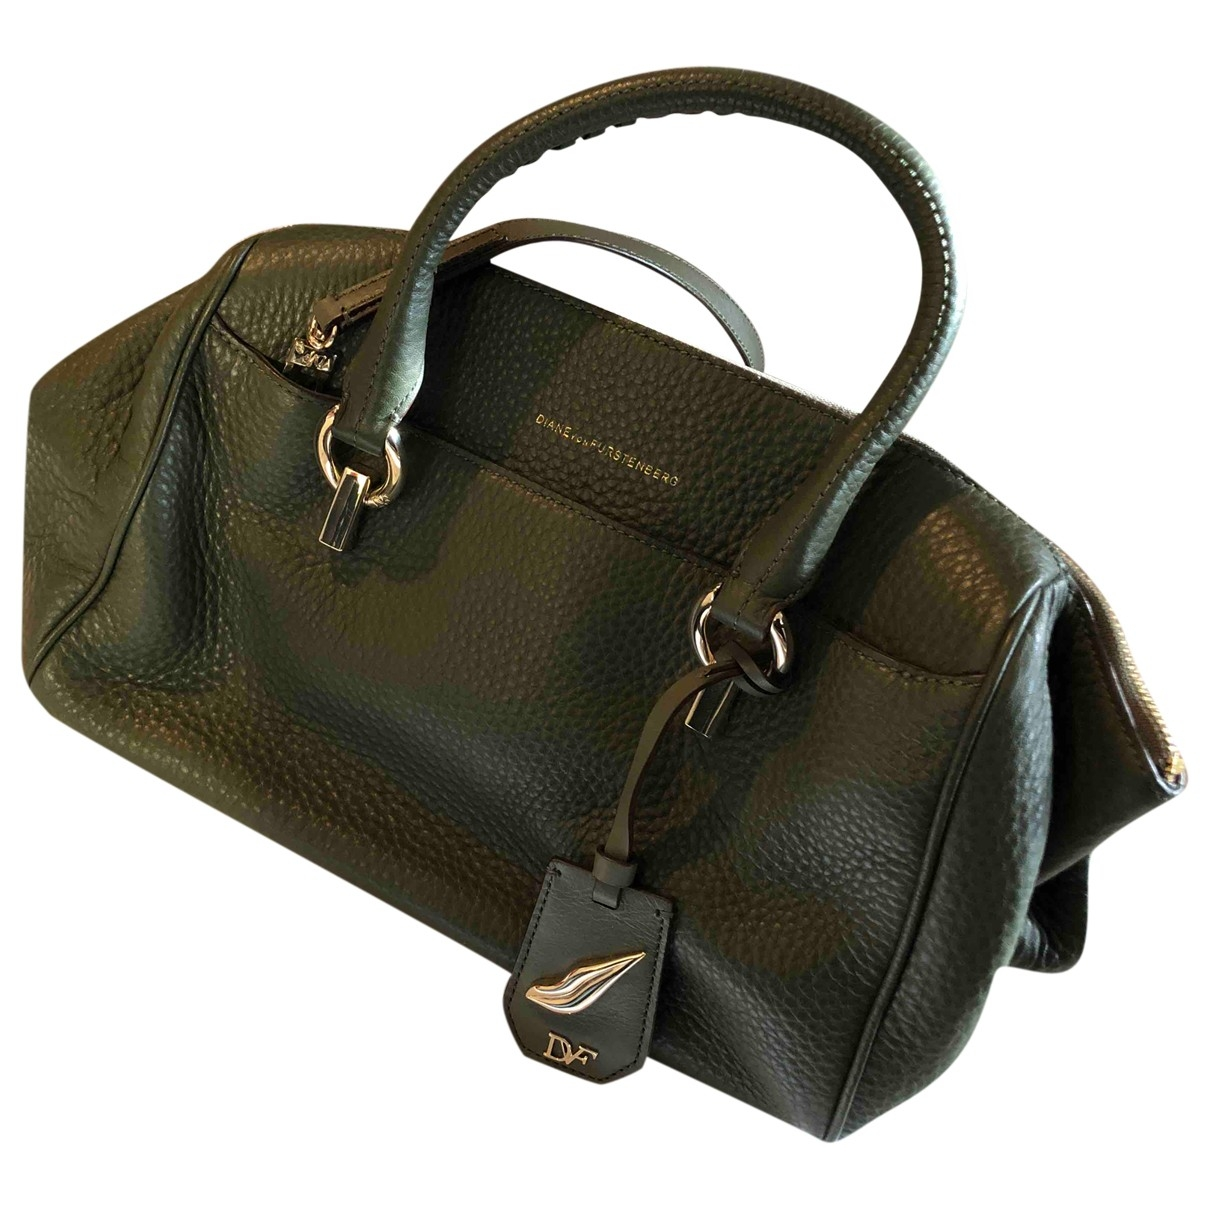 Diane Von Furstenberg \N Khaki Leather handbag for Women \N